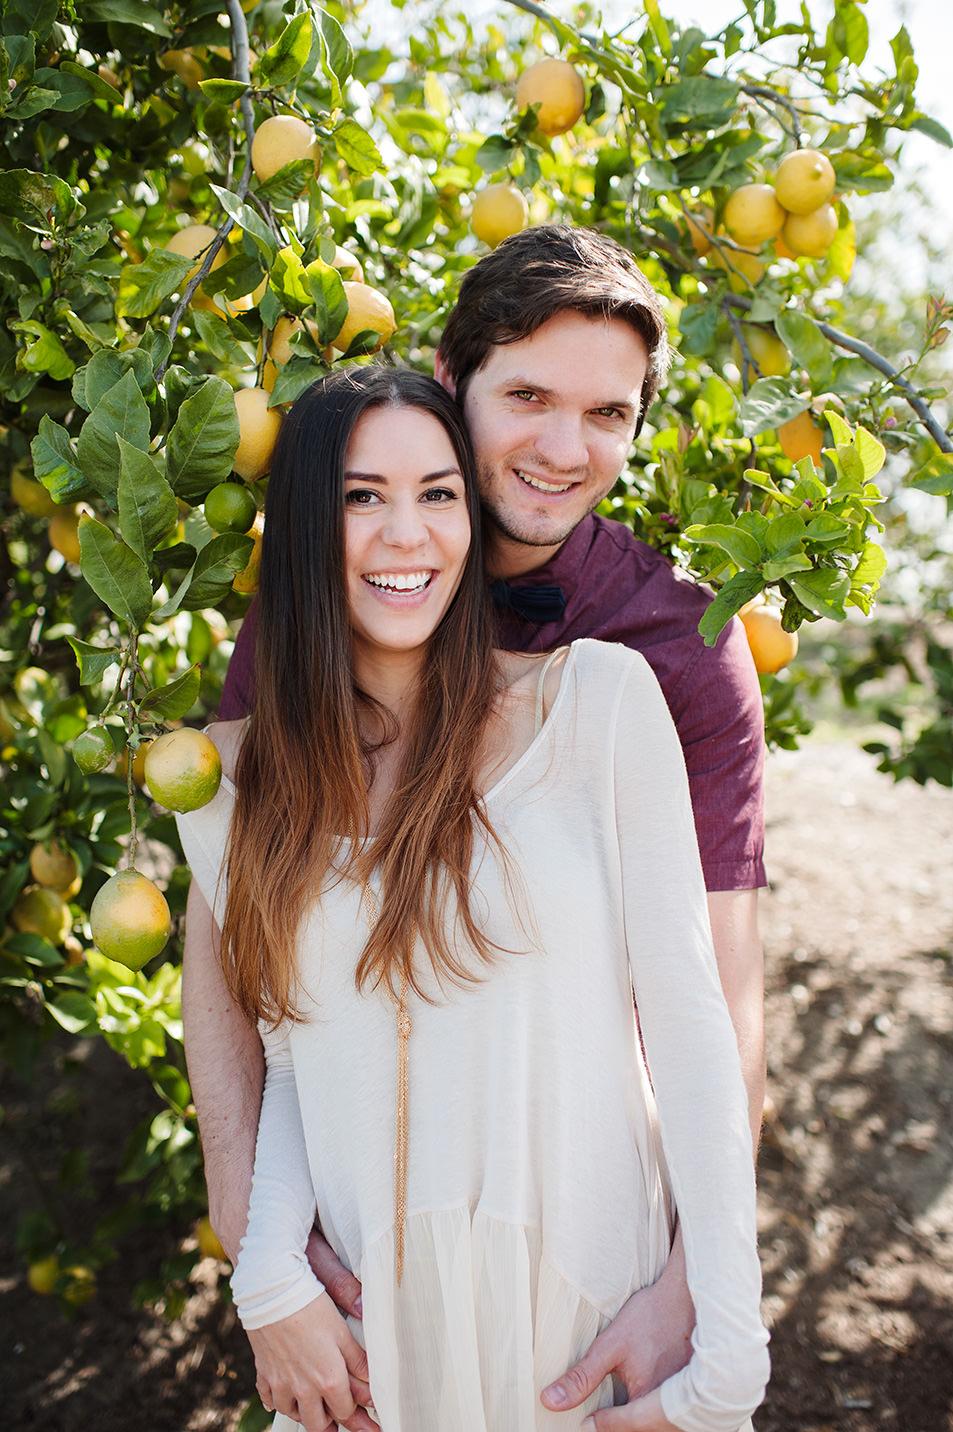 Malibu-California-engagement-photos-california-wedding-photographer09.jpg